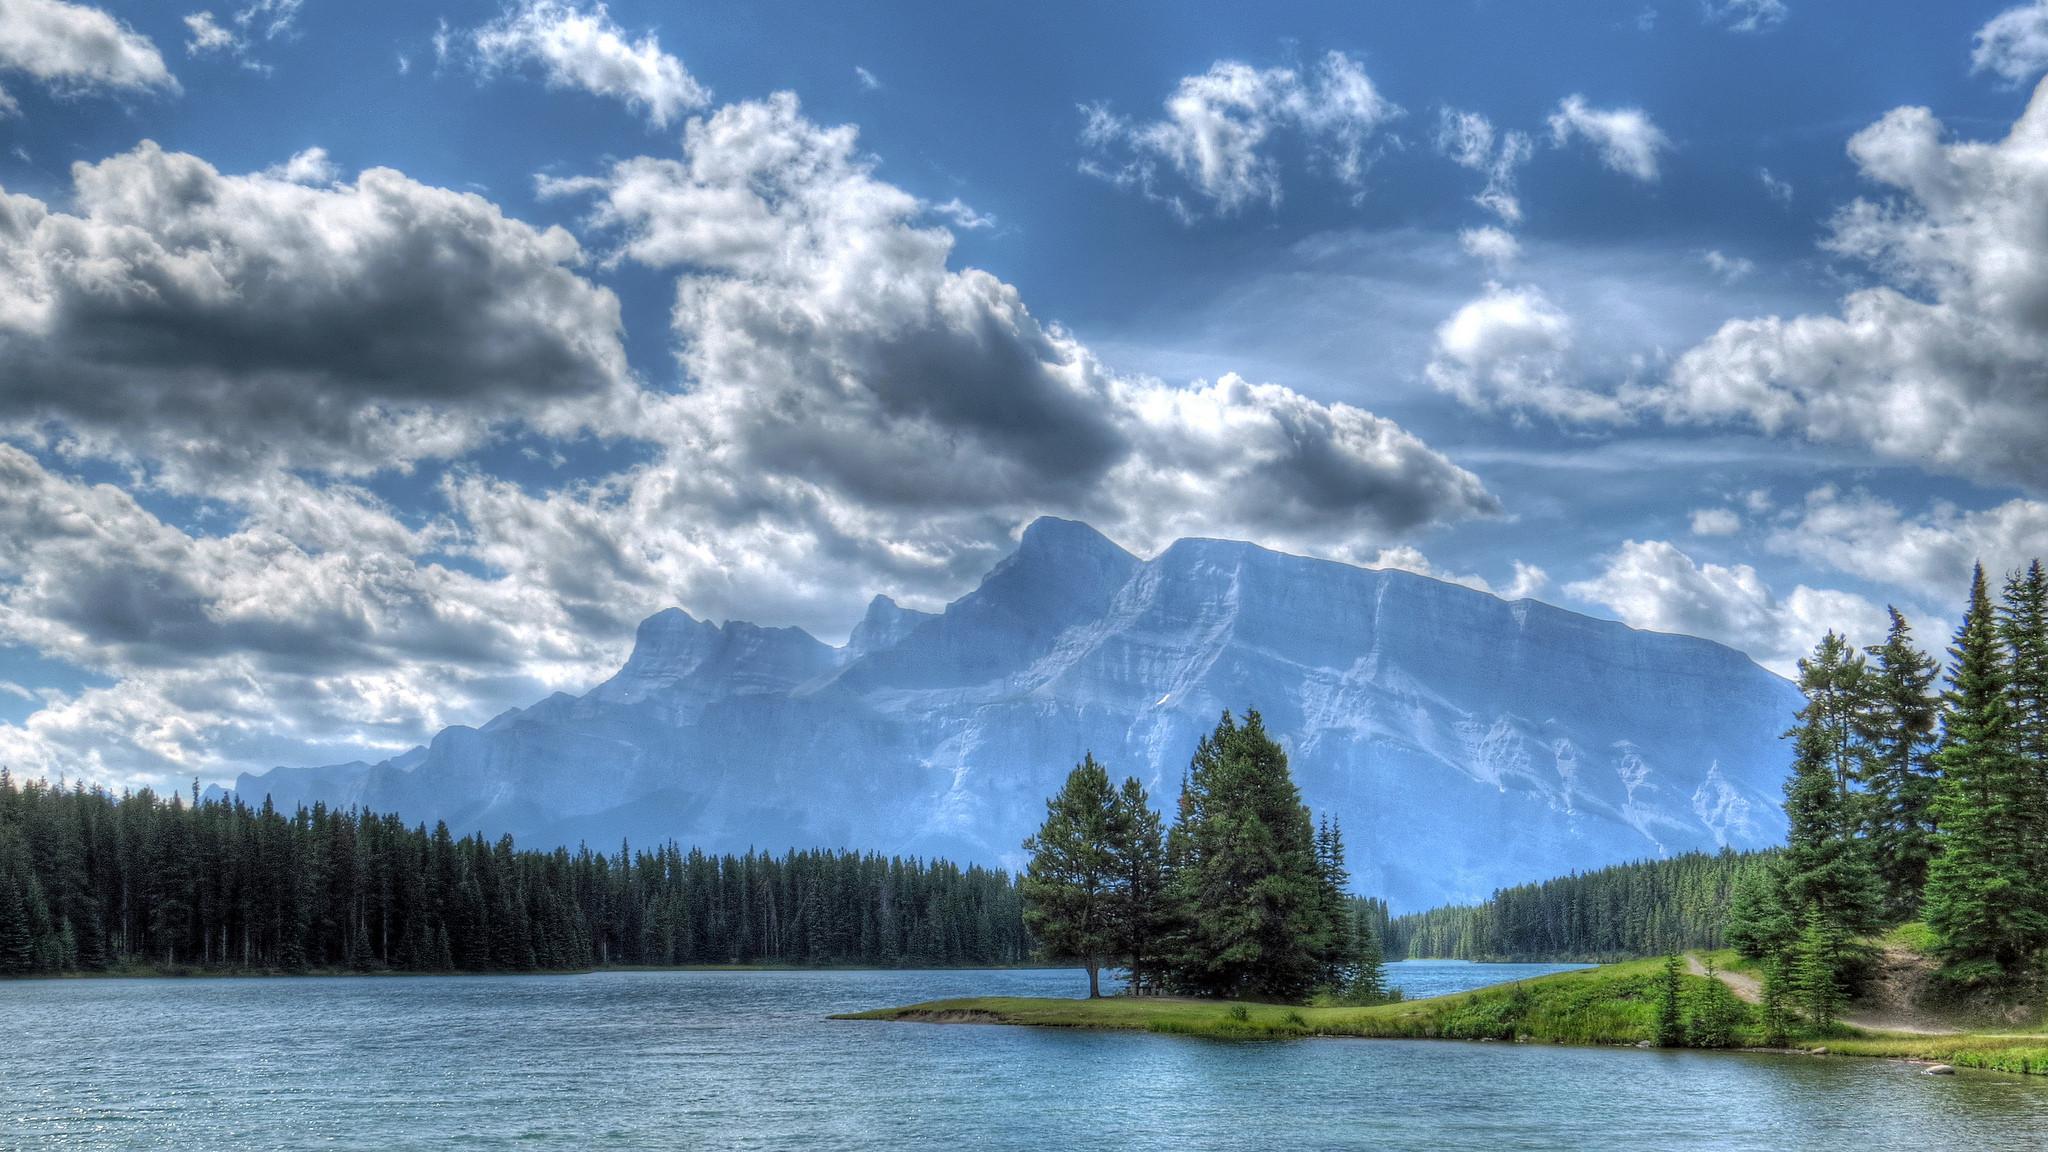 обои Banff National Park, Two Jack Lake, озеро, горы картинки фото